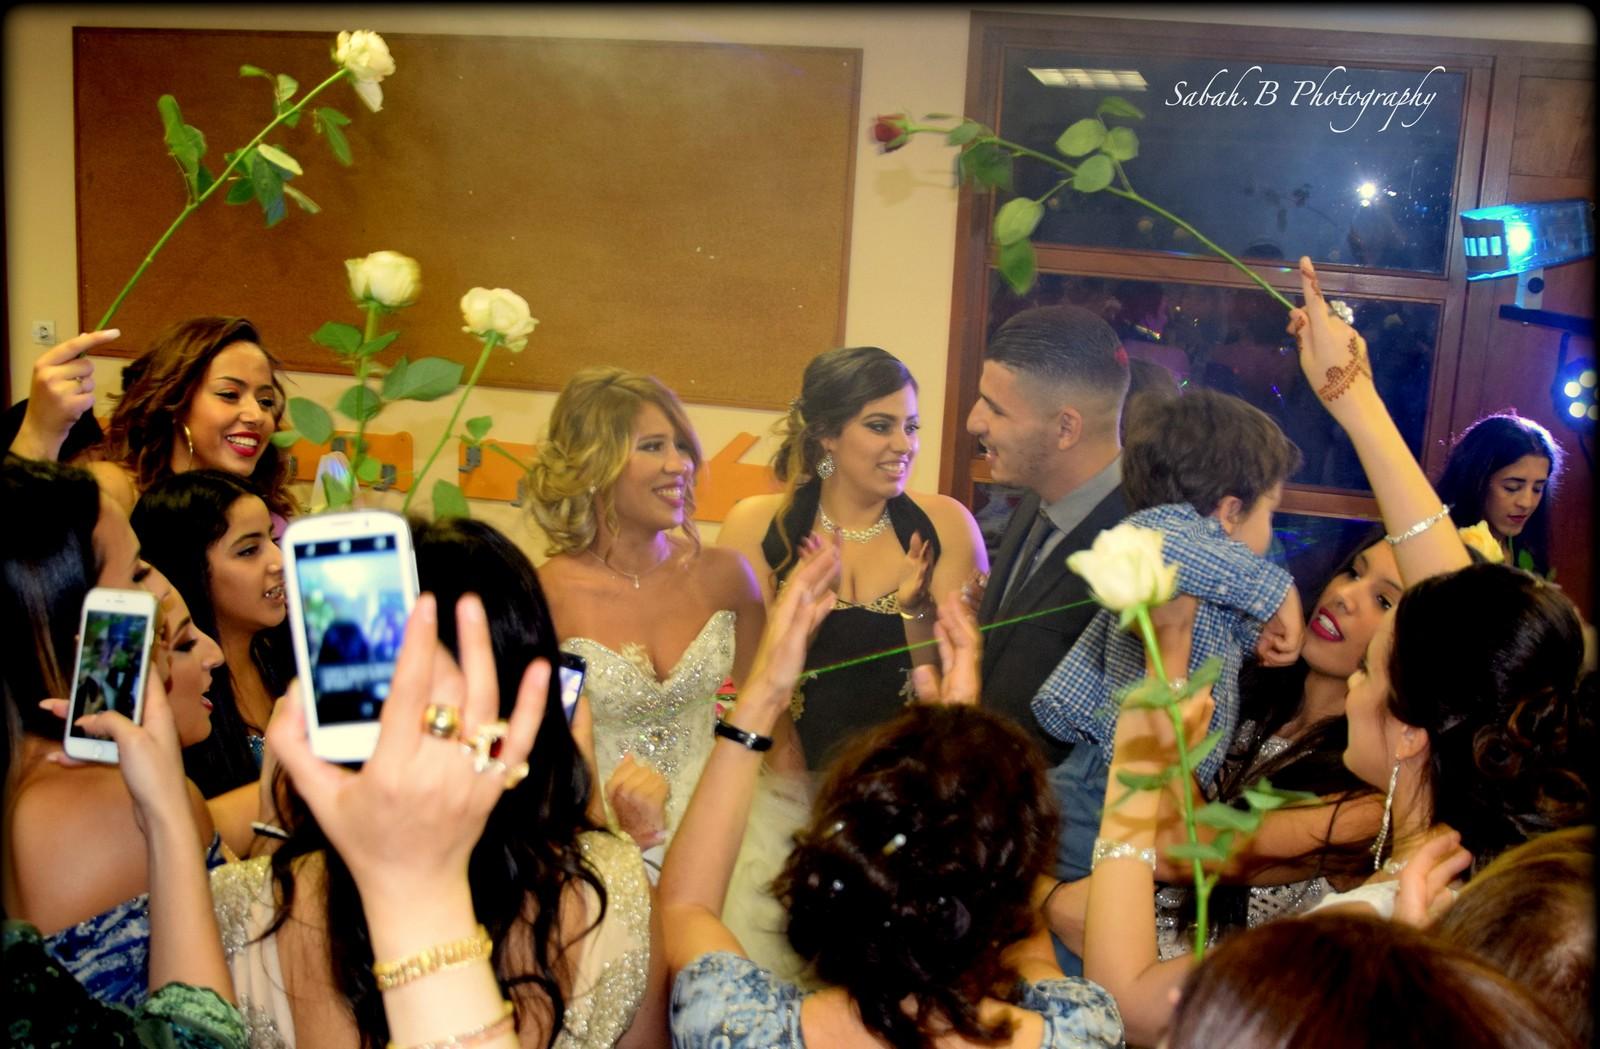 photographe de mariage festif rhone : SABAH.B